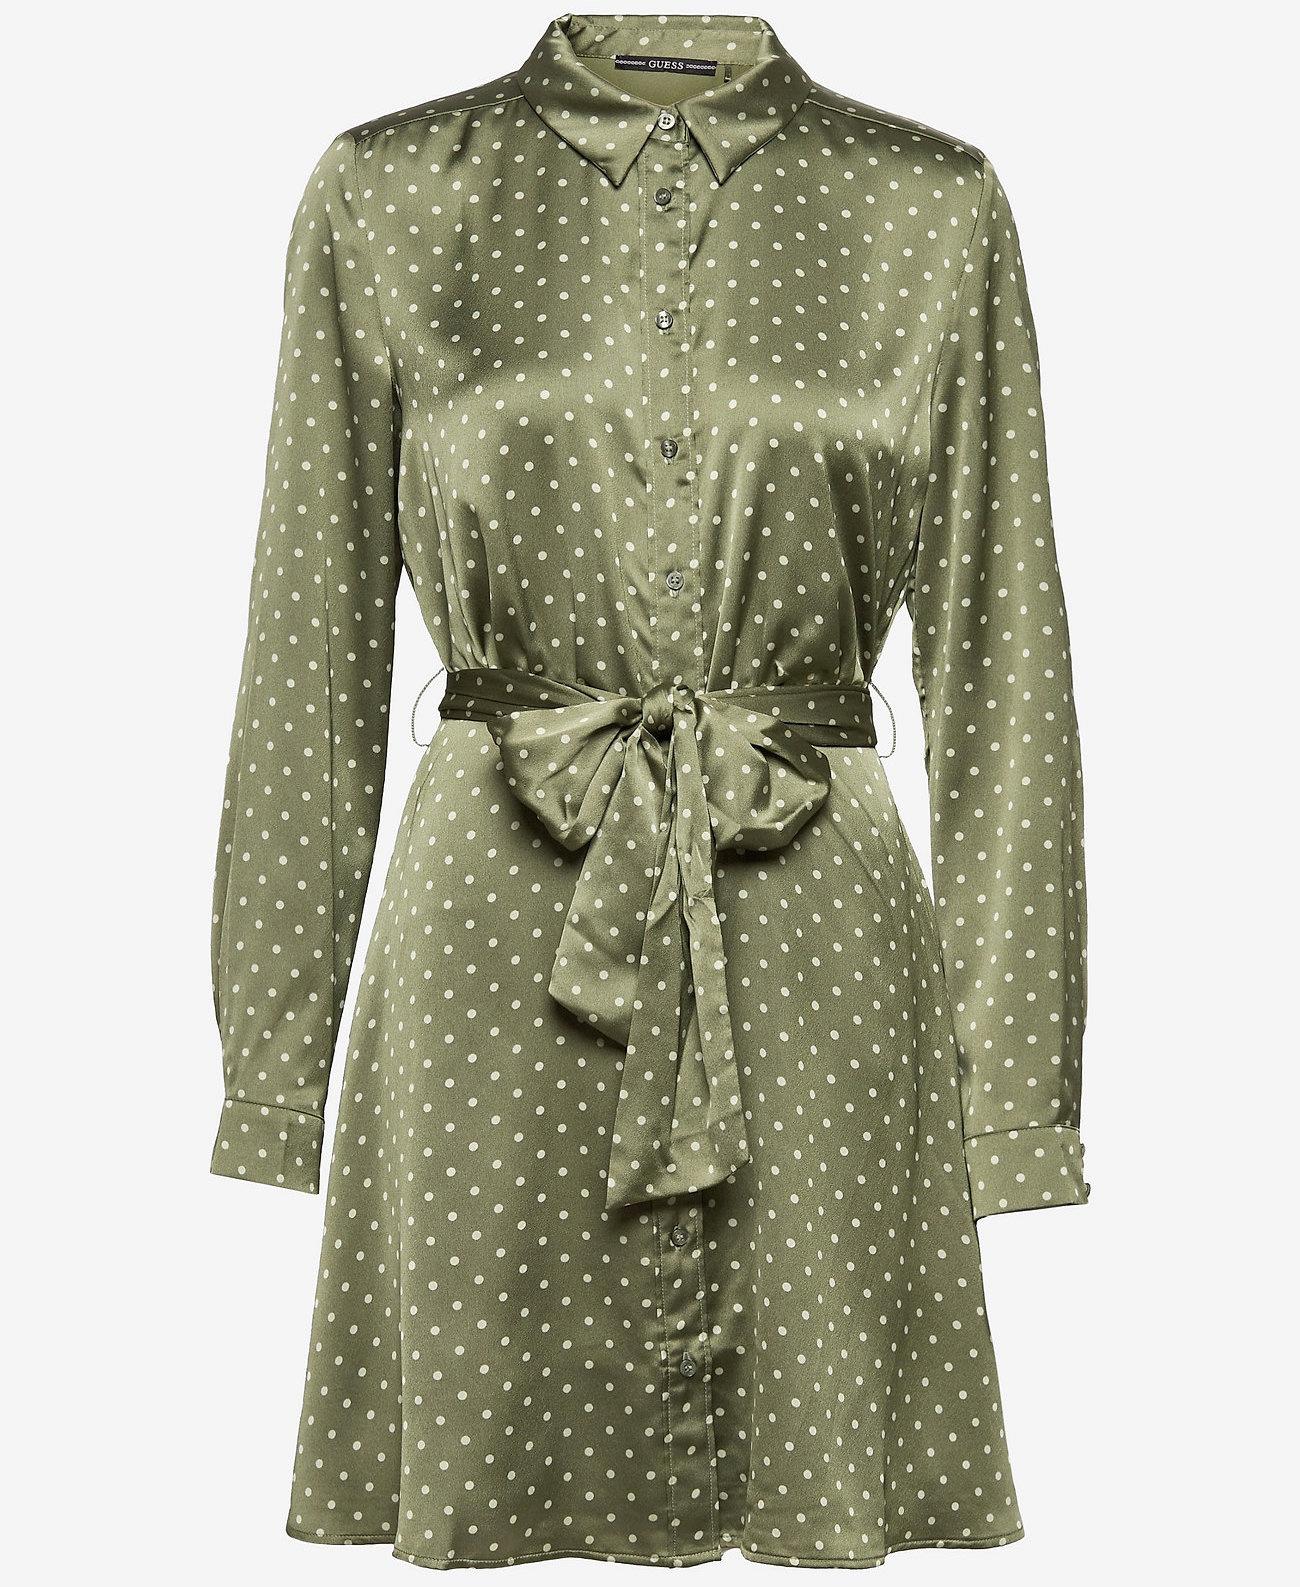 GUESS Jeans jurk, olijfgroen